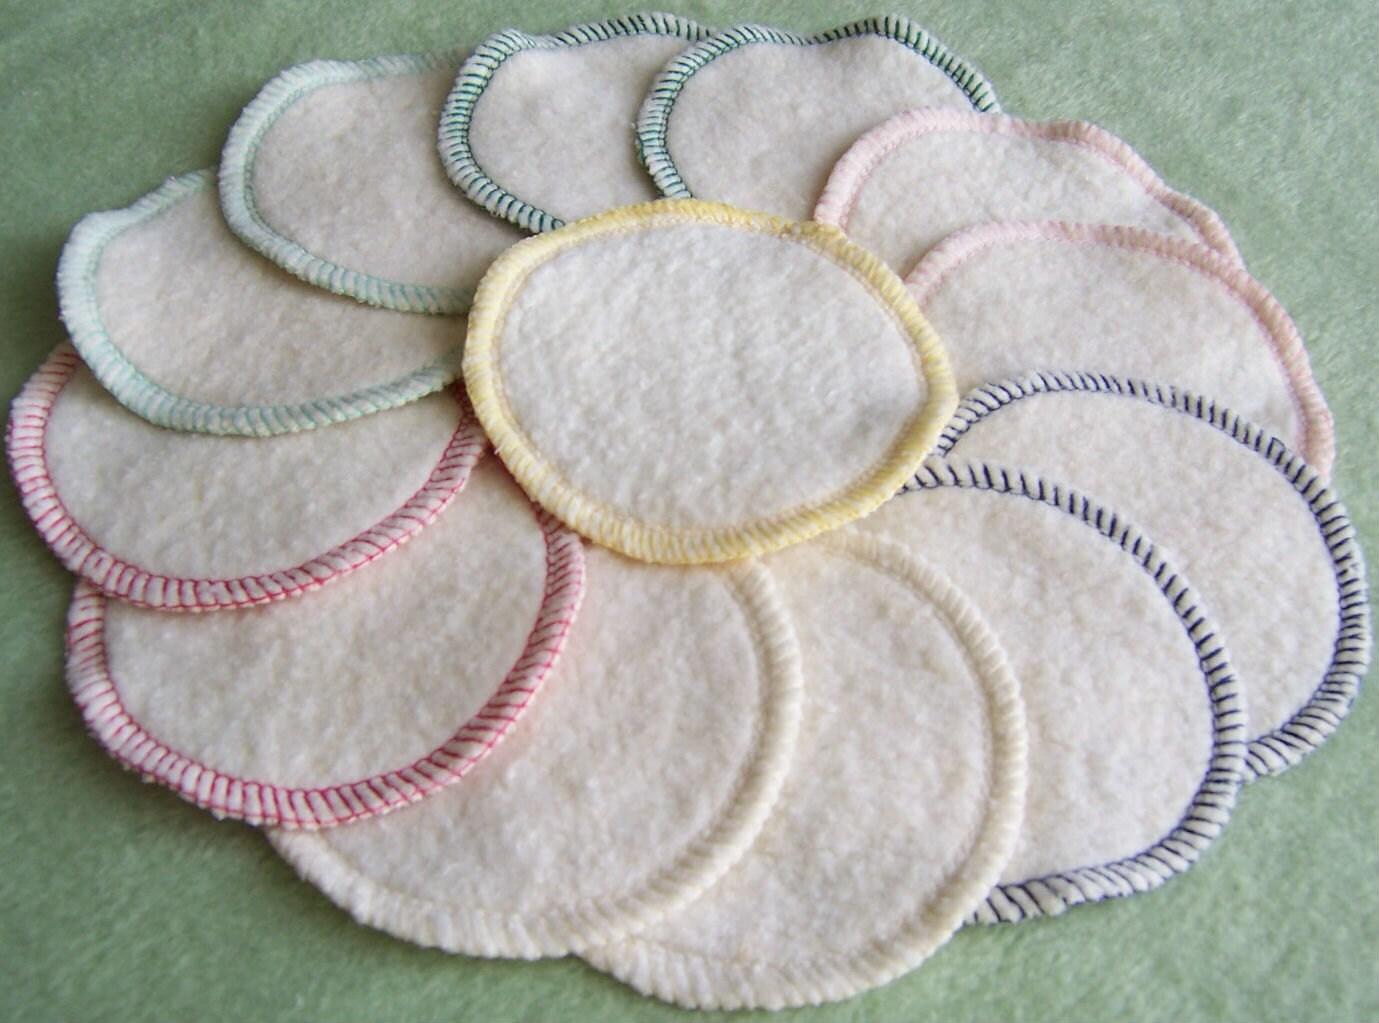 Hemp Facial Cleansing Rounds Pads Washable Reusable Organic